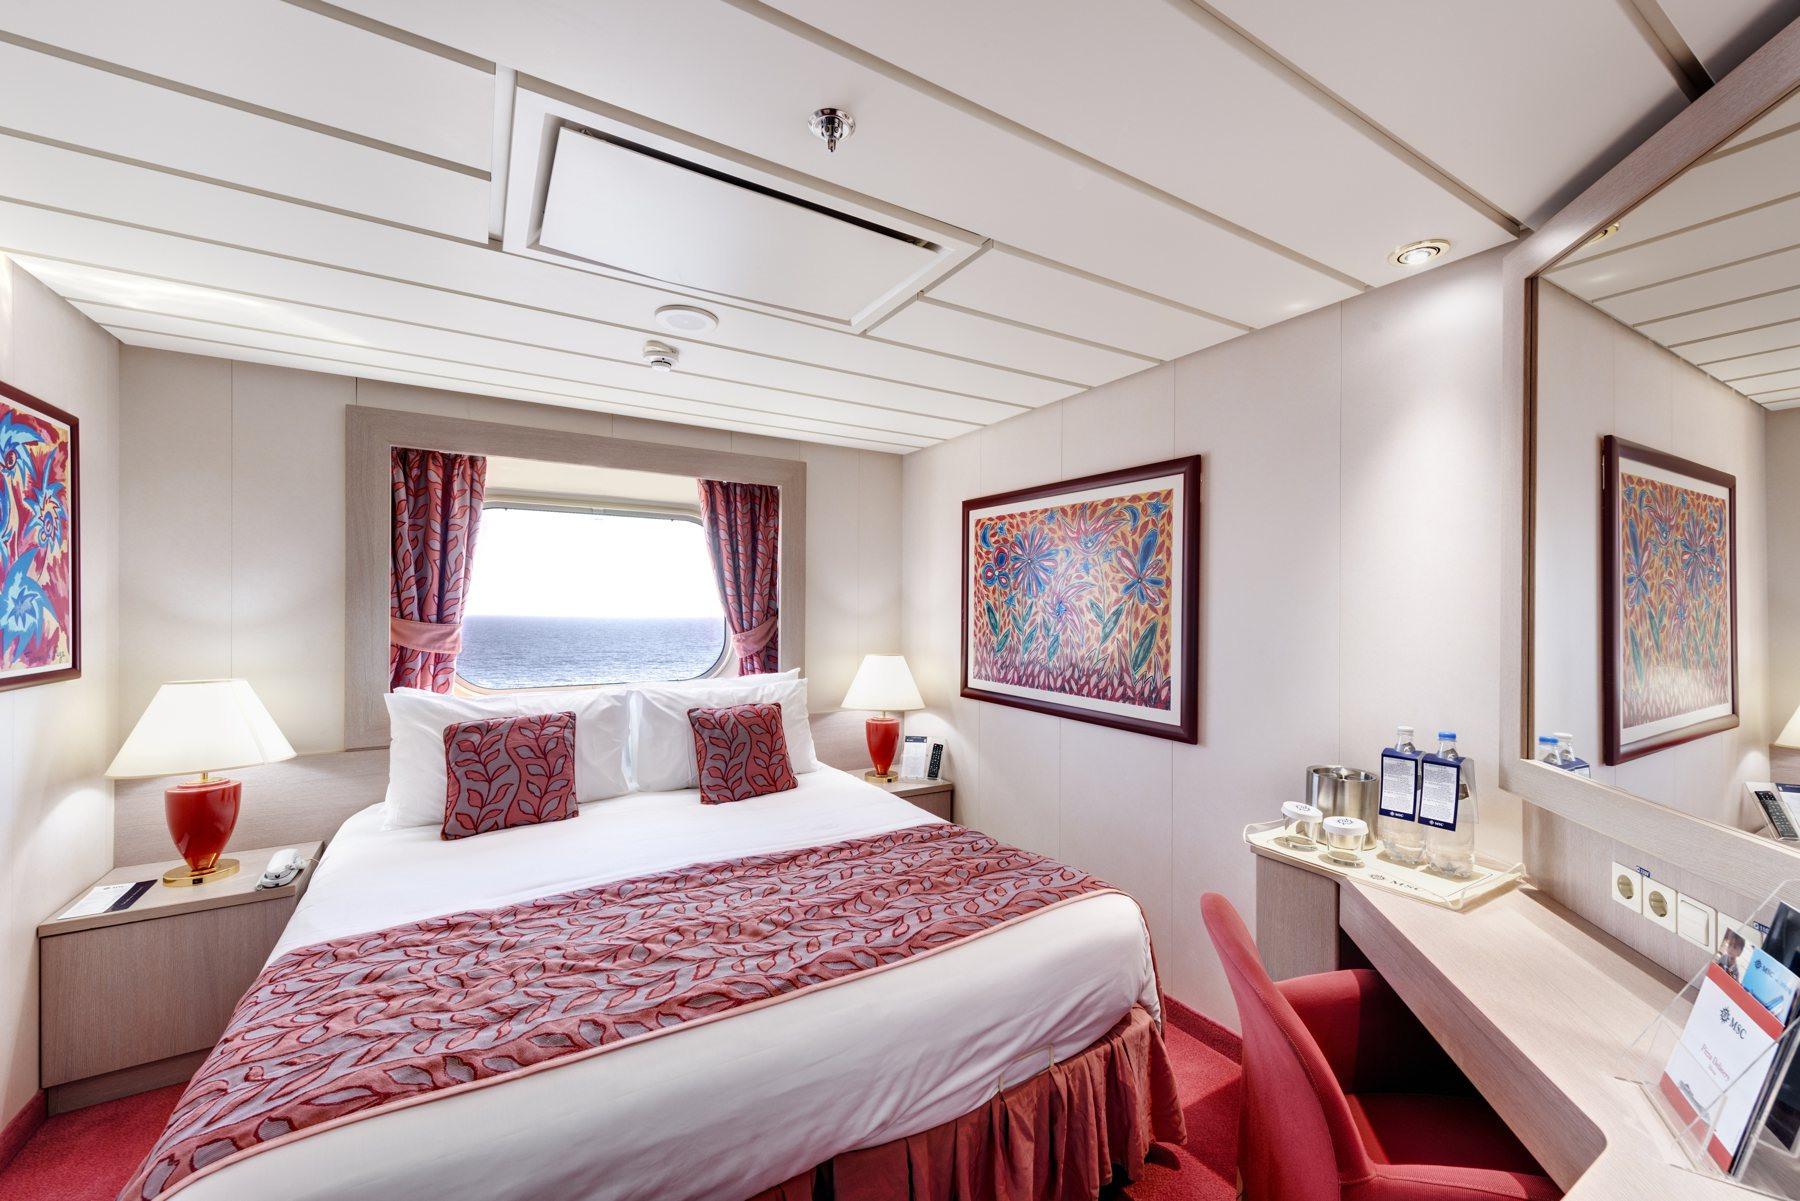 MSC Lirica Class ocean view Cabin.jpg